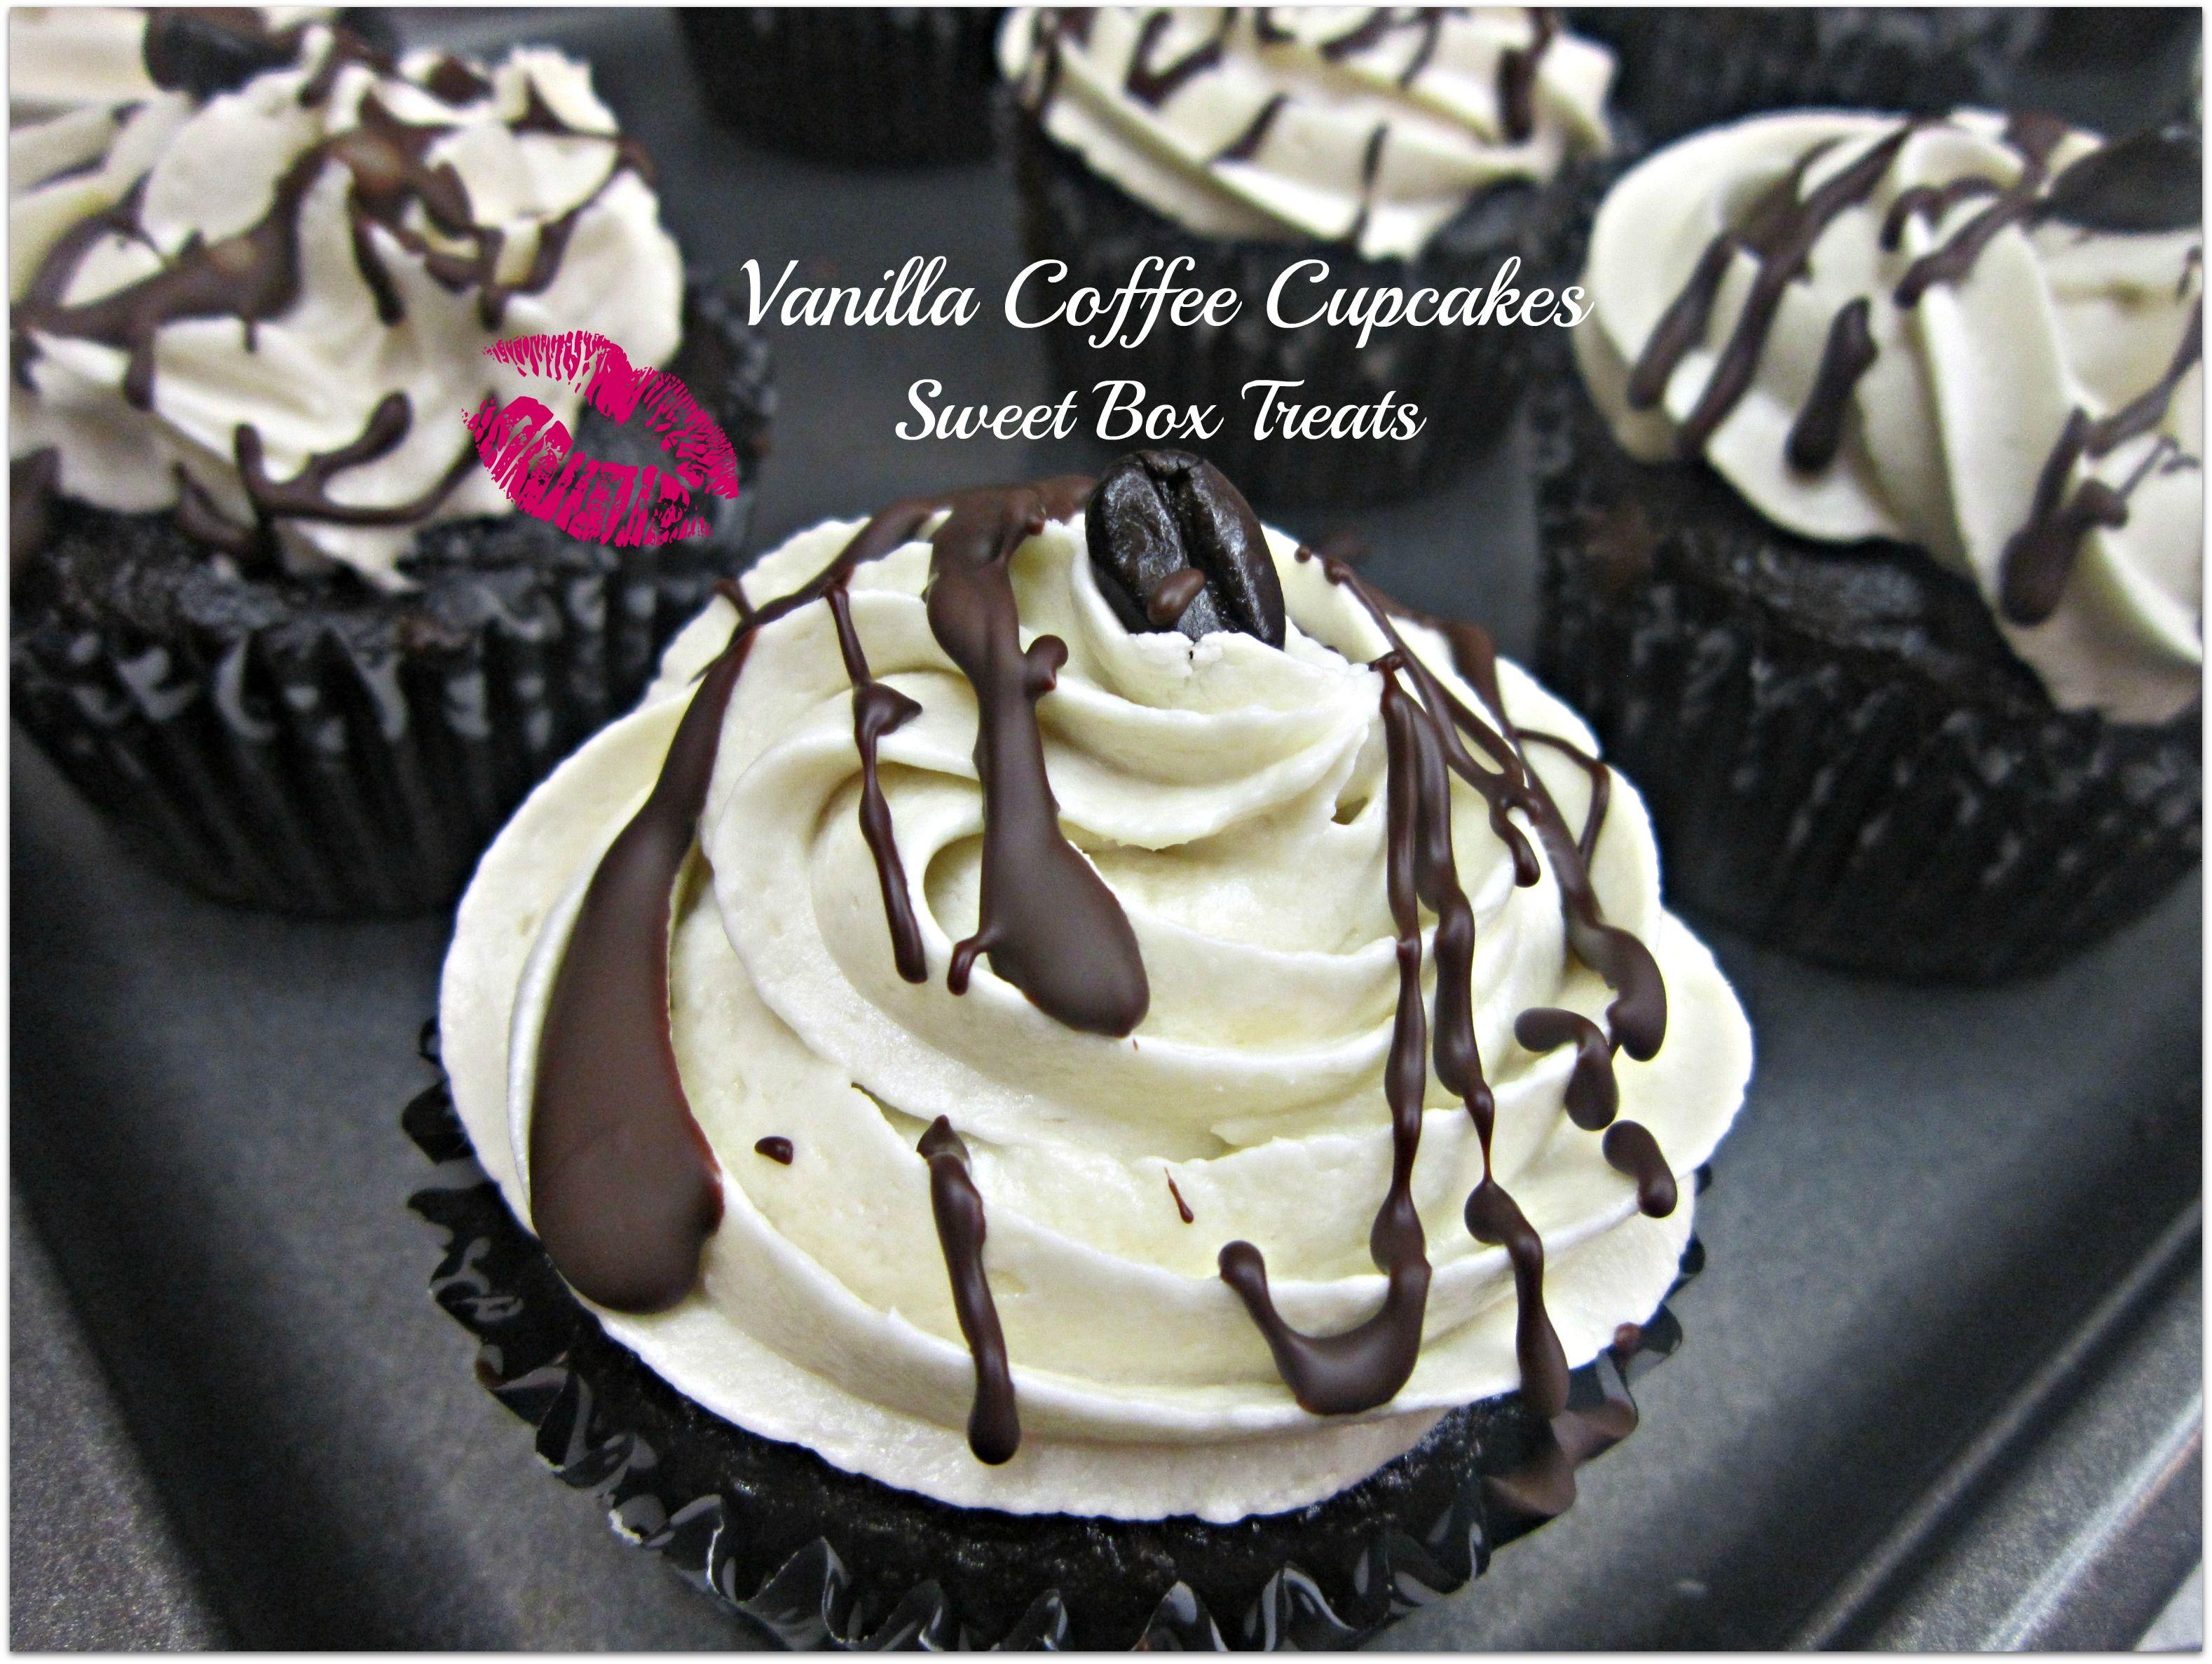 Gluten Free Vegan Cupcakes By Sweet Box Treats Gluten Free Vanilla Vegan Gluten Free Cupcakes Sweets Treats